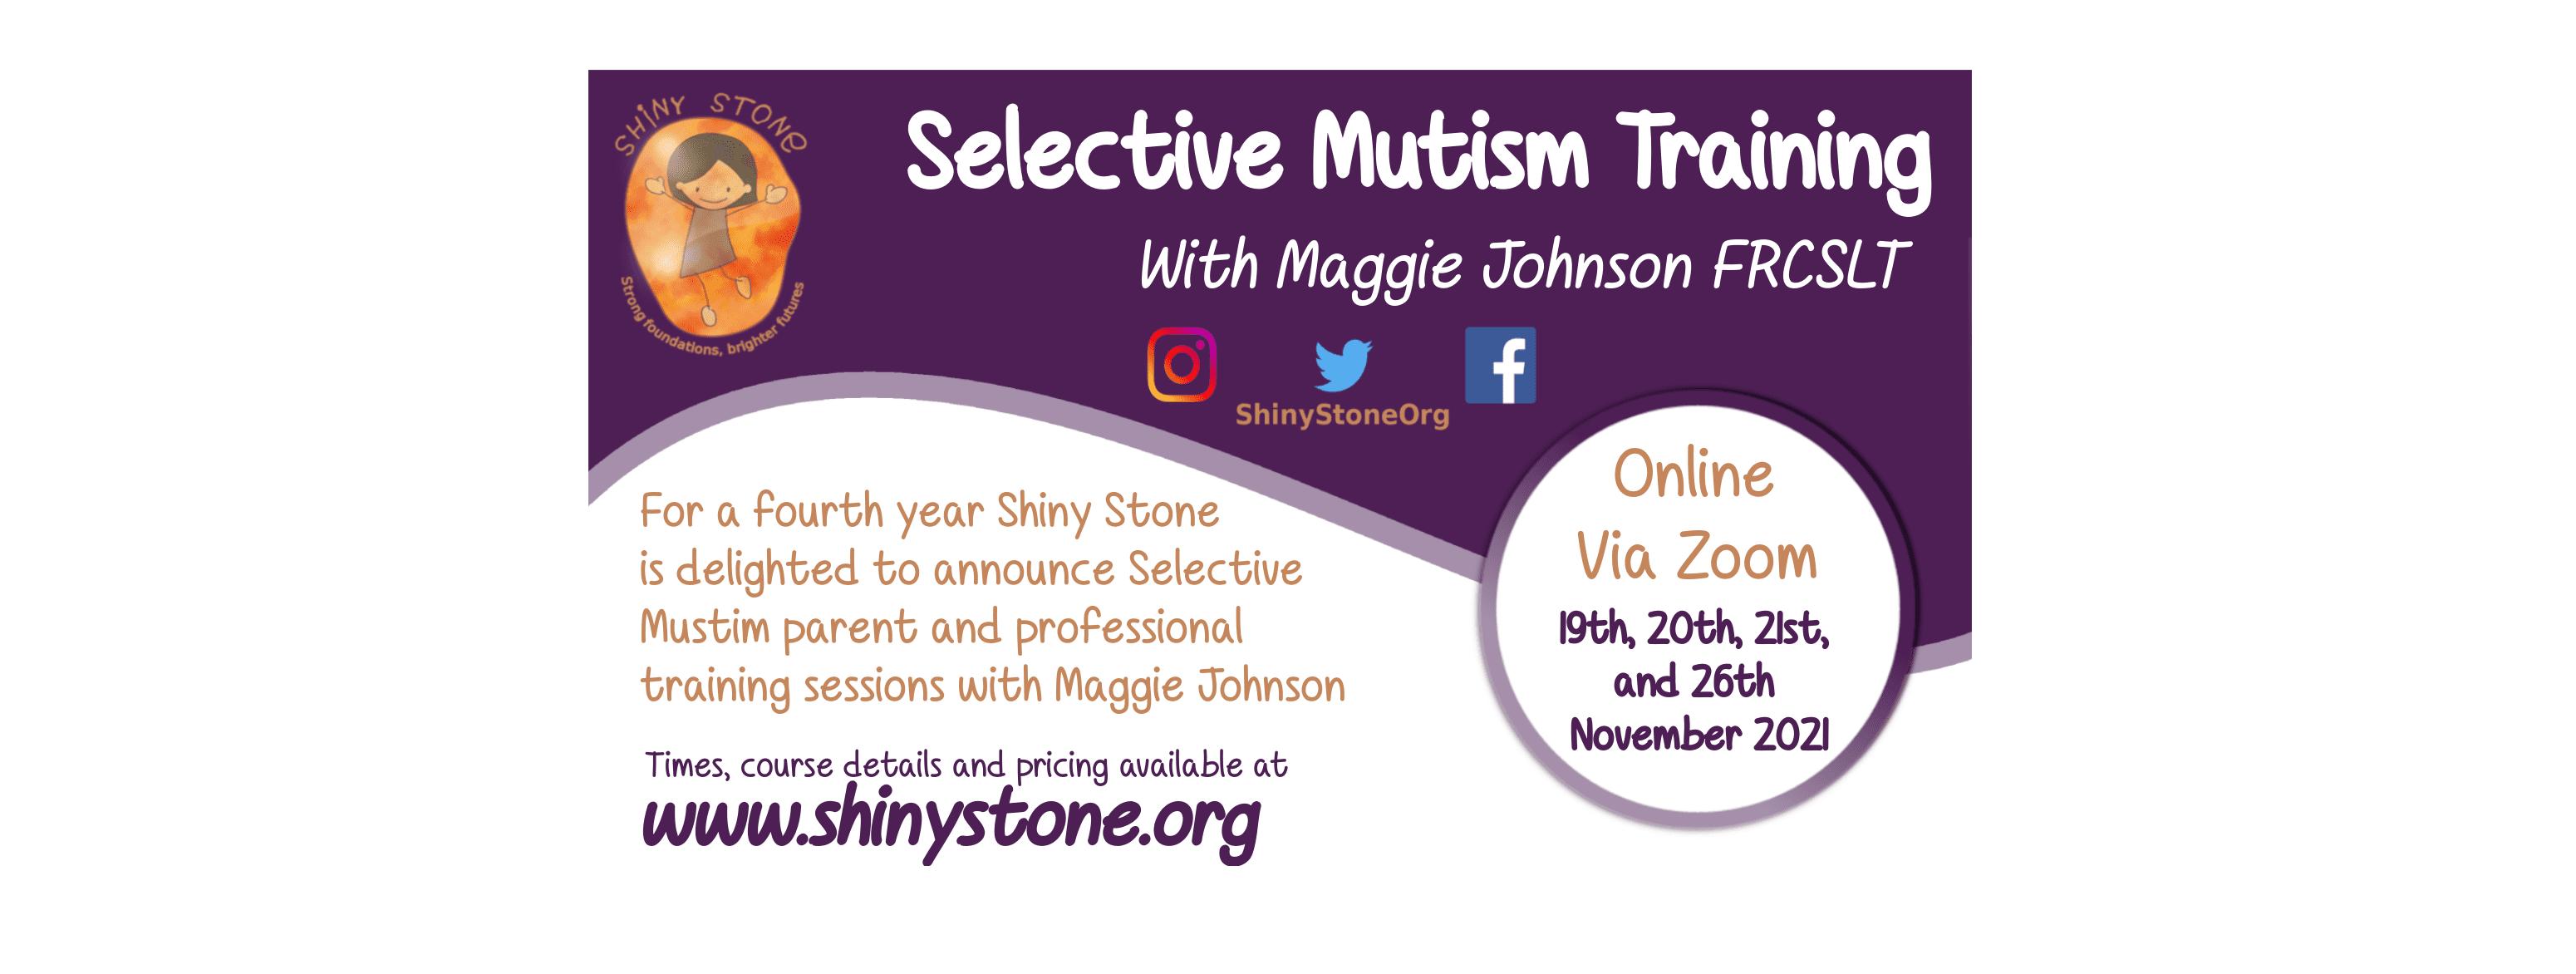 Selective Mutism Training 2021